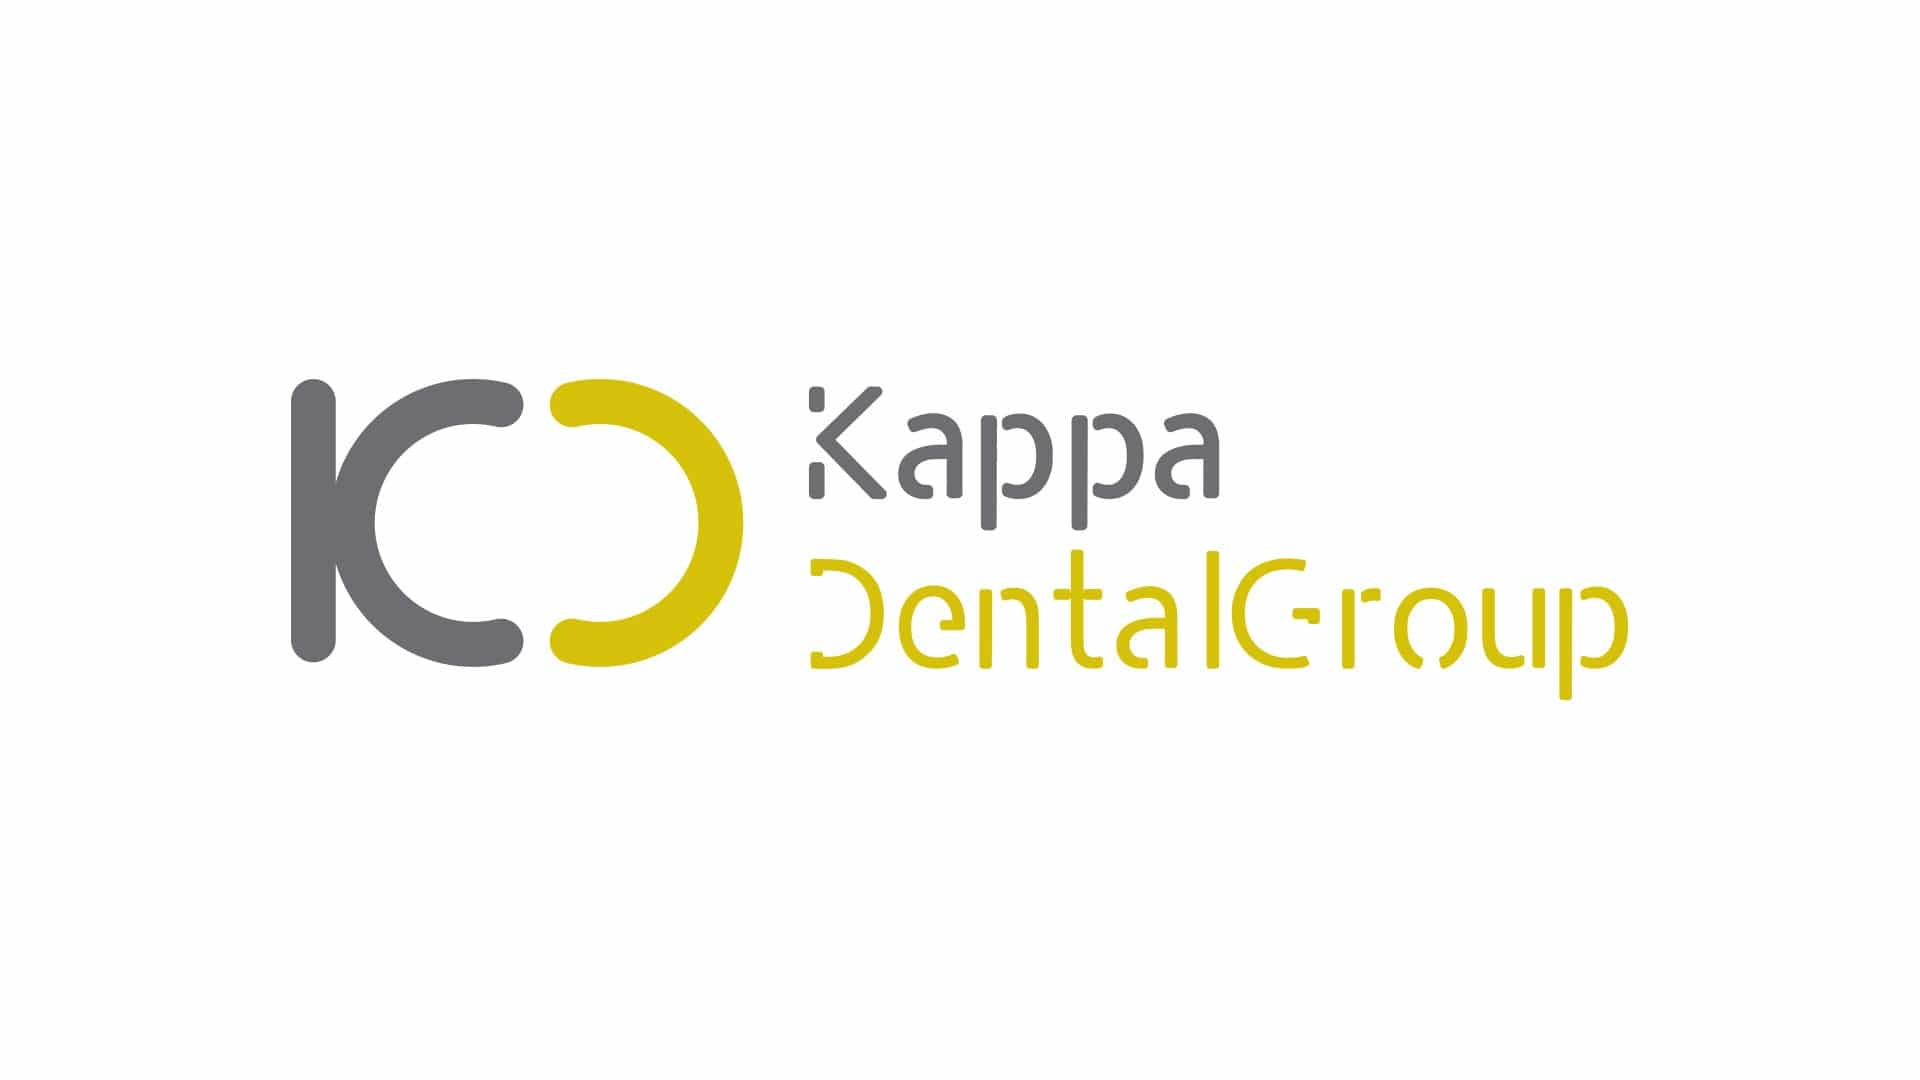 Kappa Dental Group